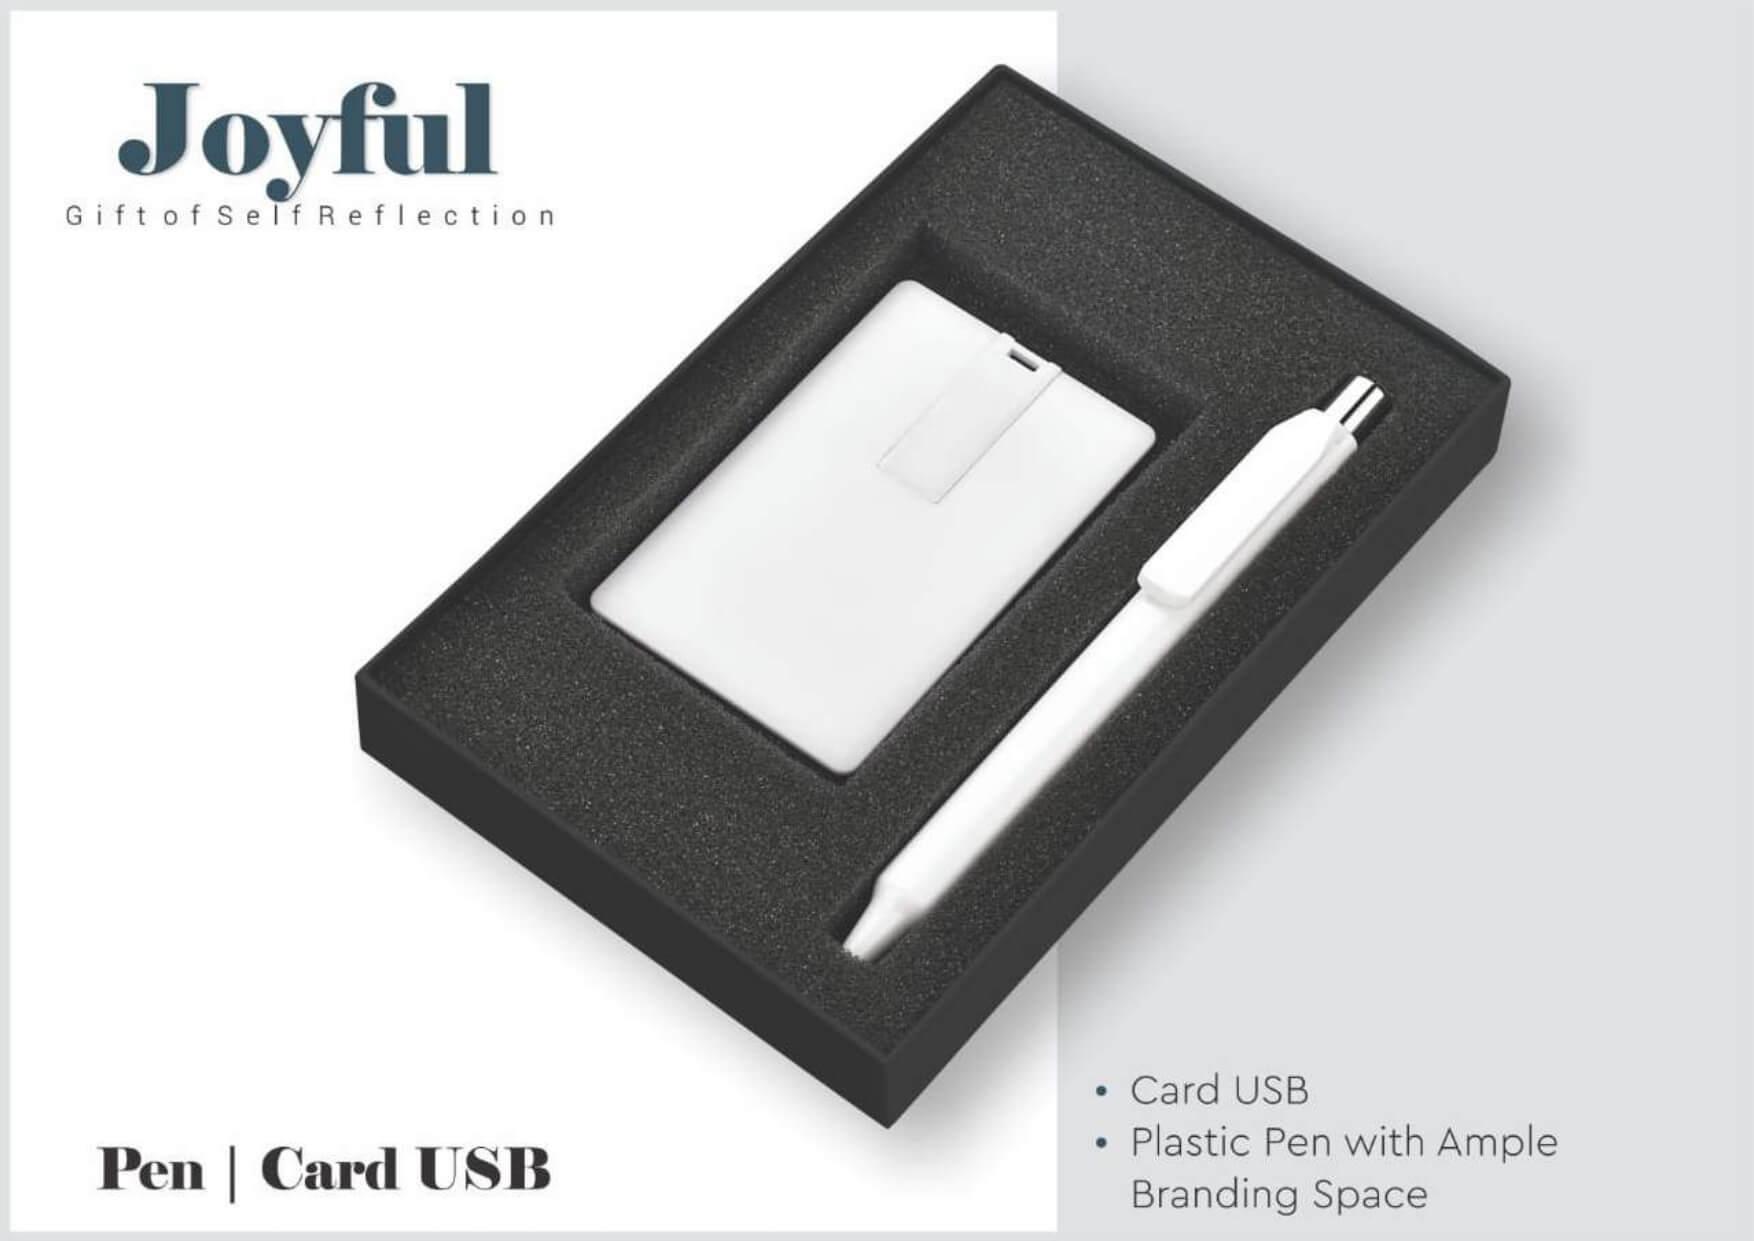 Card USB and Pen Joyful